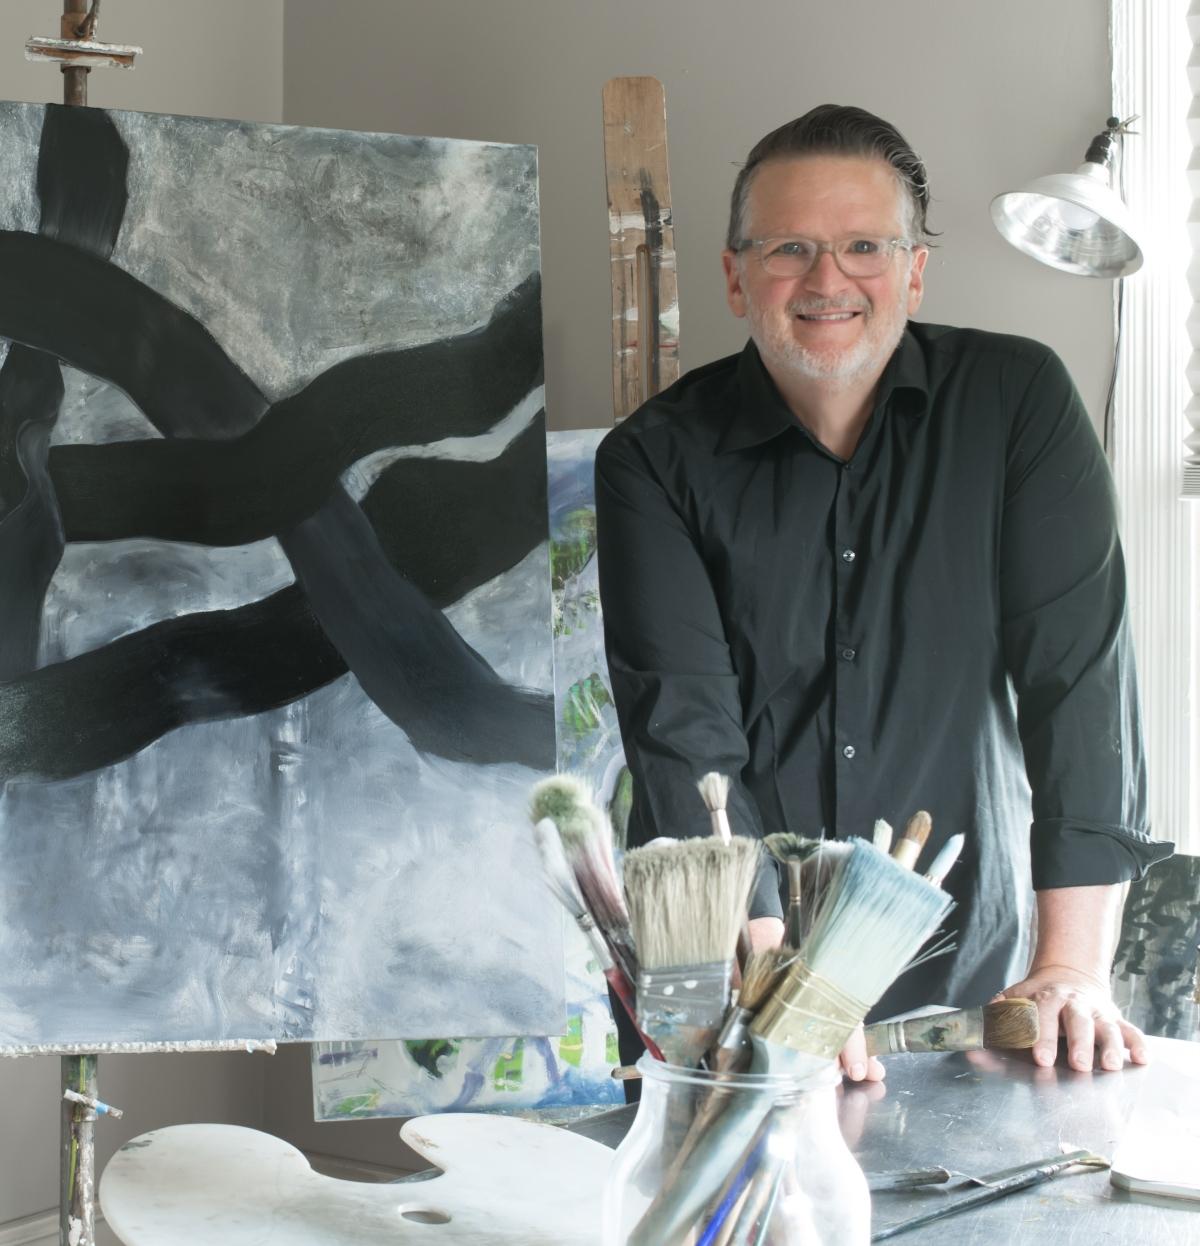 Meet the Artist & Designer: John Ishmael